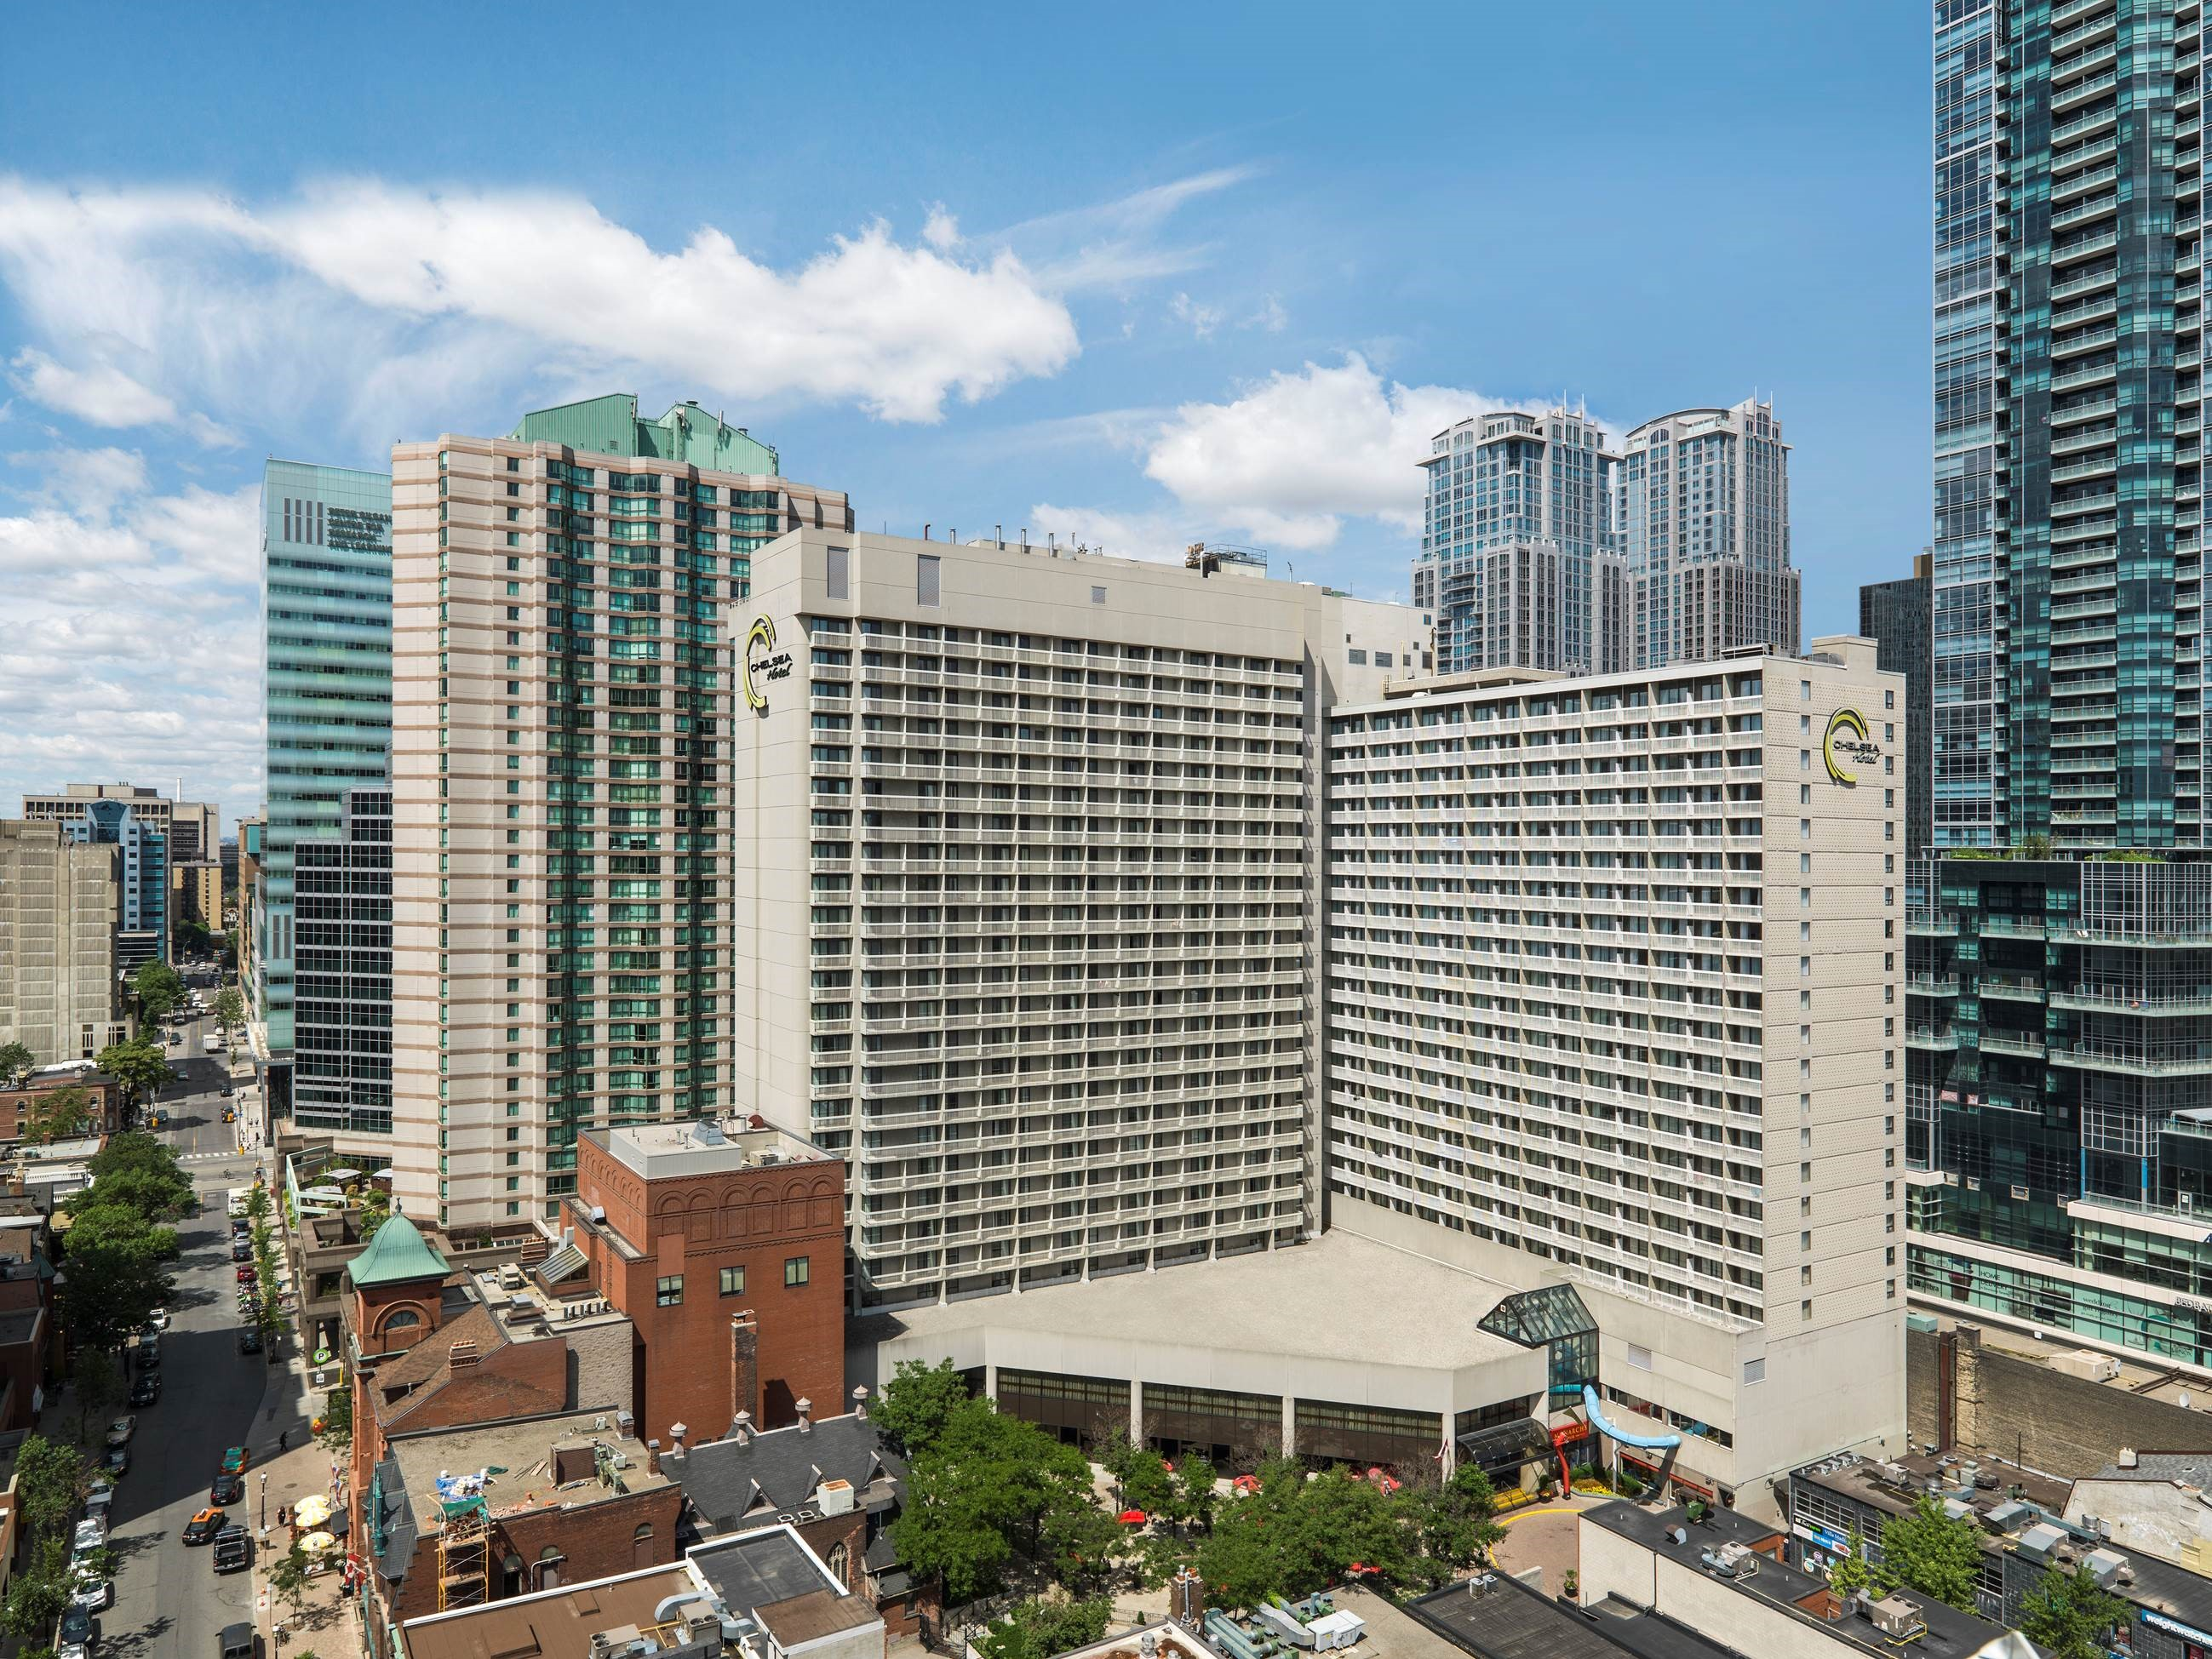 CHELSEA HOTEL, TORONTO in Toronto: Chelsea Hotel Daytime